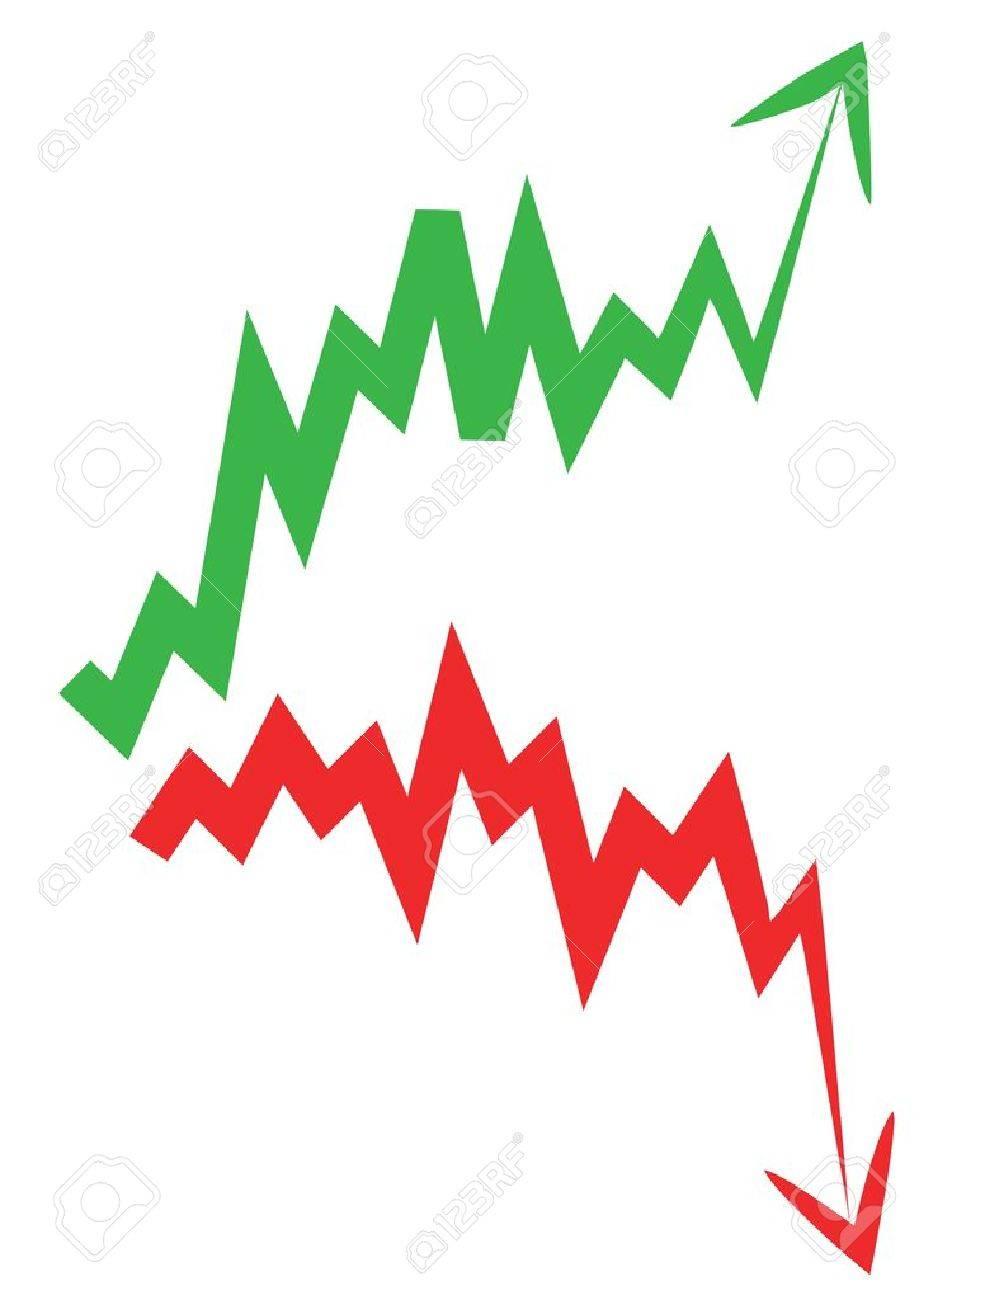 stock market index arrow with upward and downward arrow. Stock Vector - 11821665